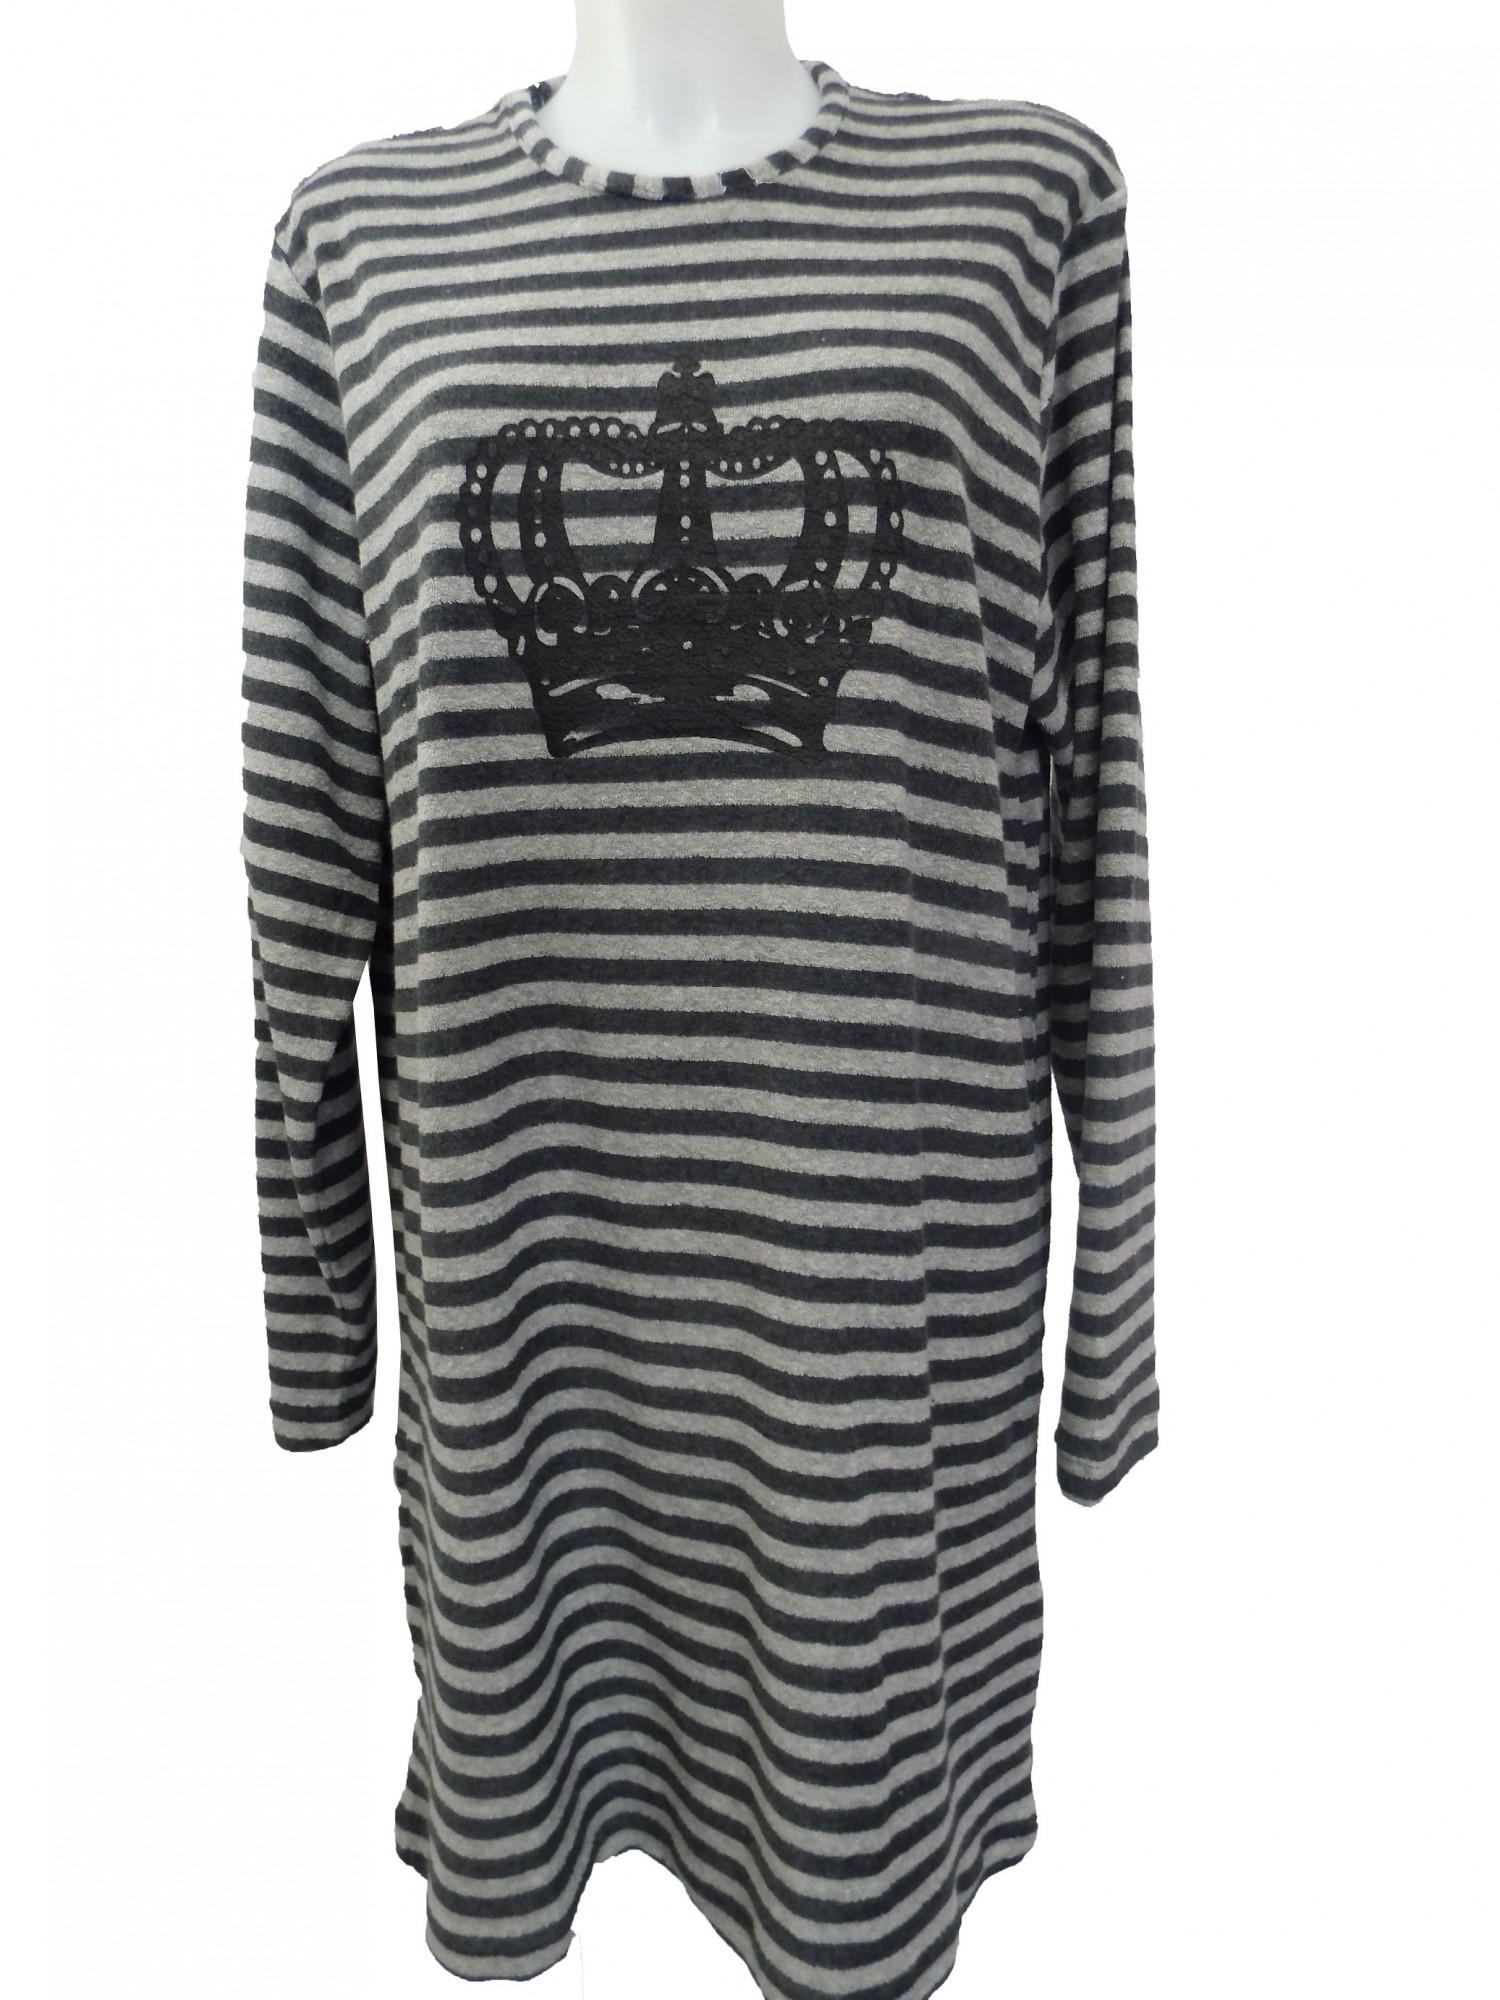 Damen Kurznachthemd Frottee Bigshirt 58048 – Bild 2